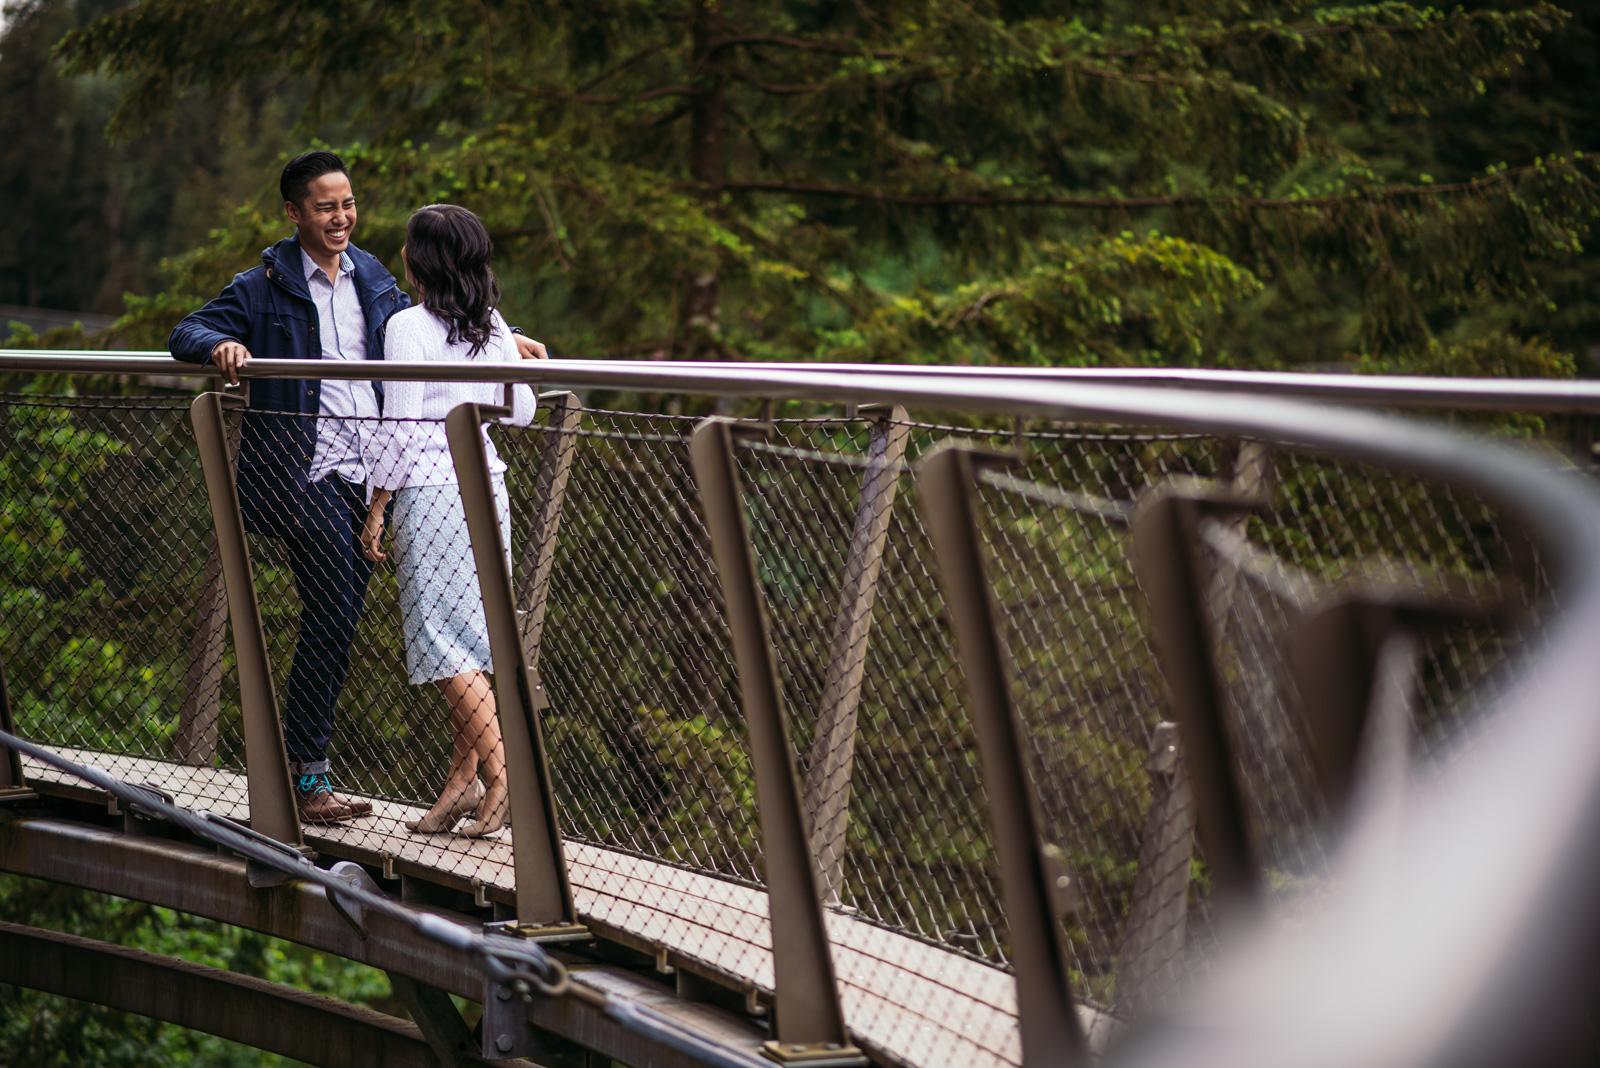 vancouver-island-wedding-photographers-capilano-suspension-bridge-engagement-2.jpg